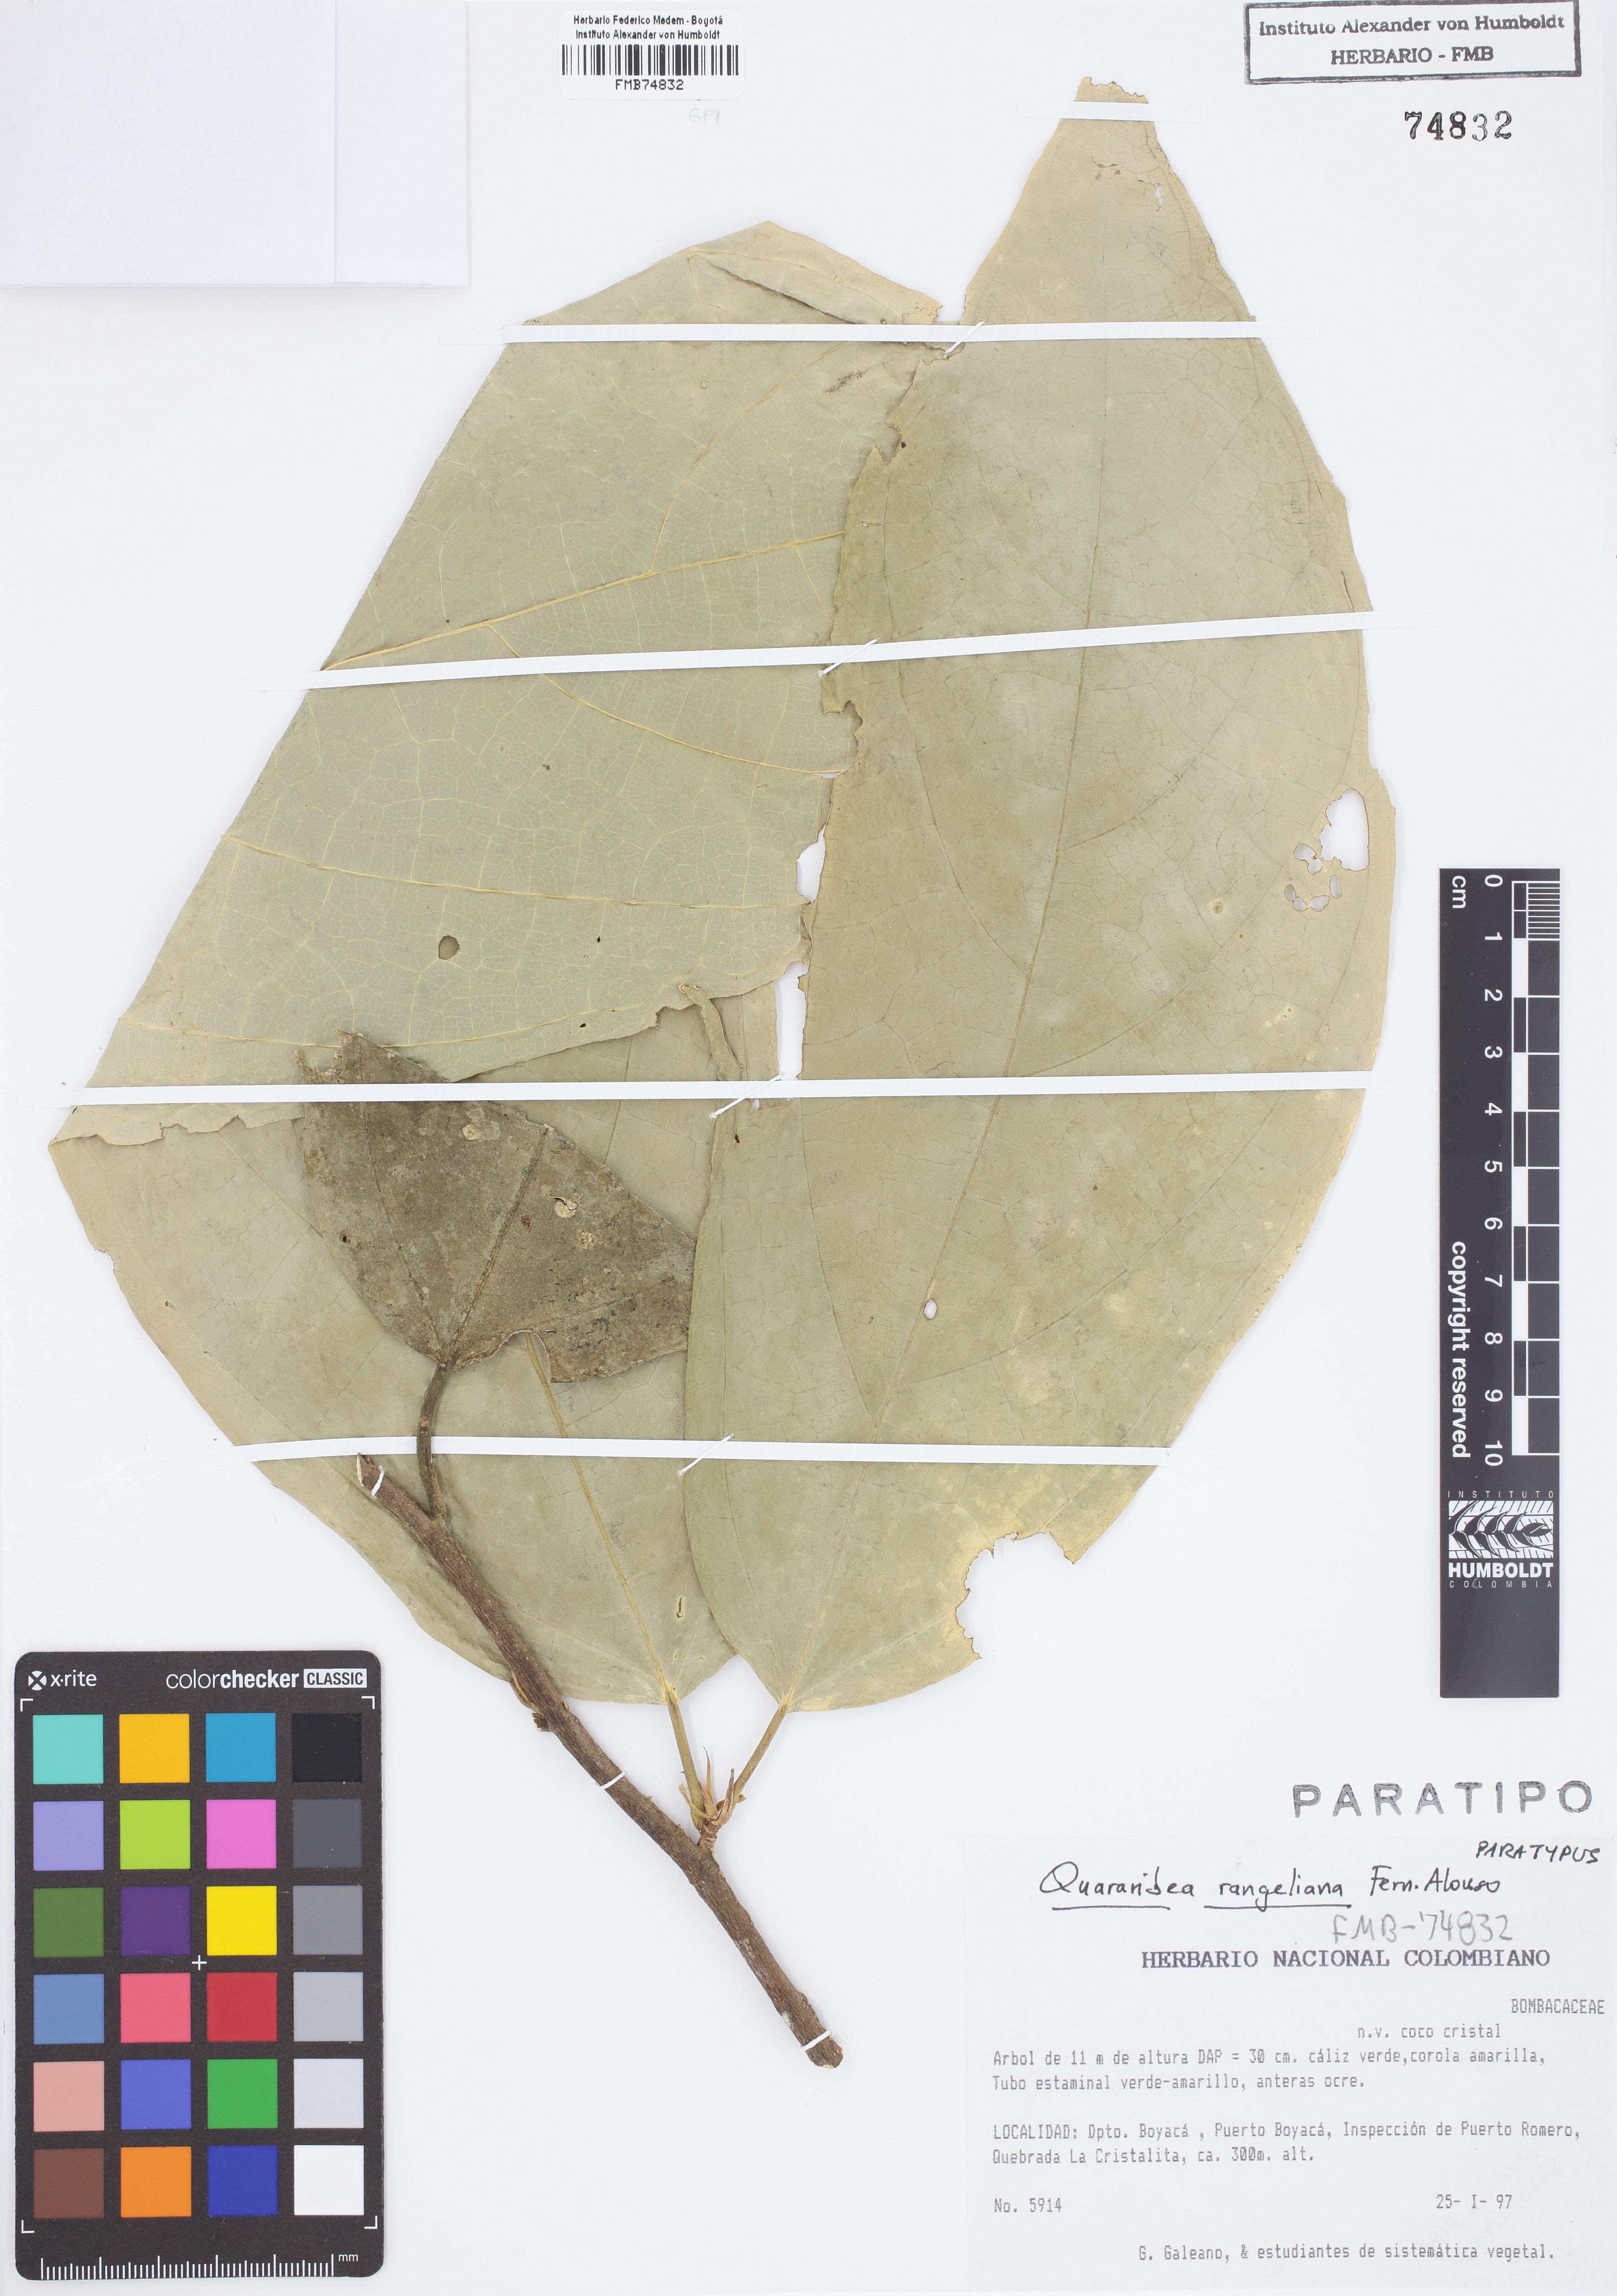 Paratipo de <em>Quararibea rangelii</em>, FMB-74832, Fotografía por Robles A.